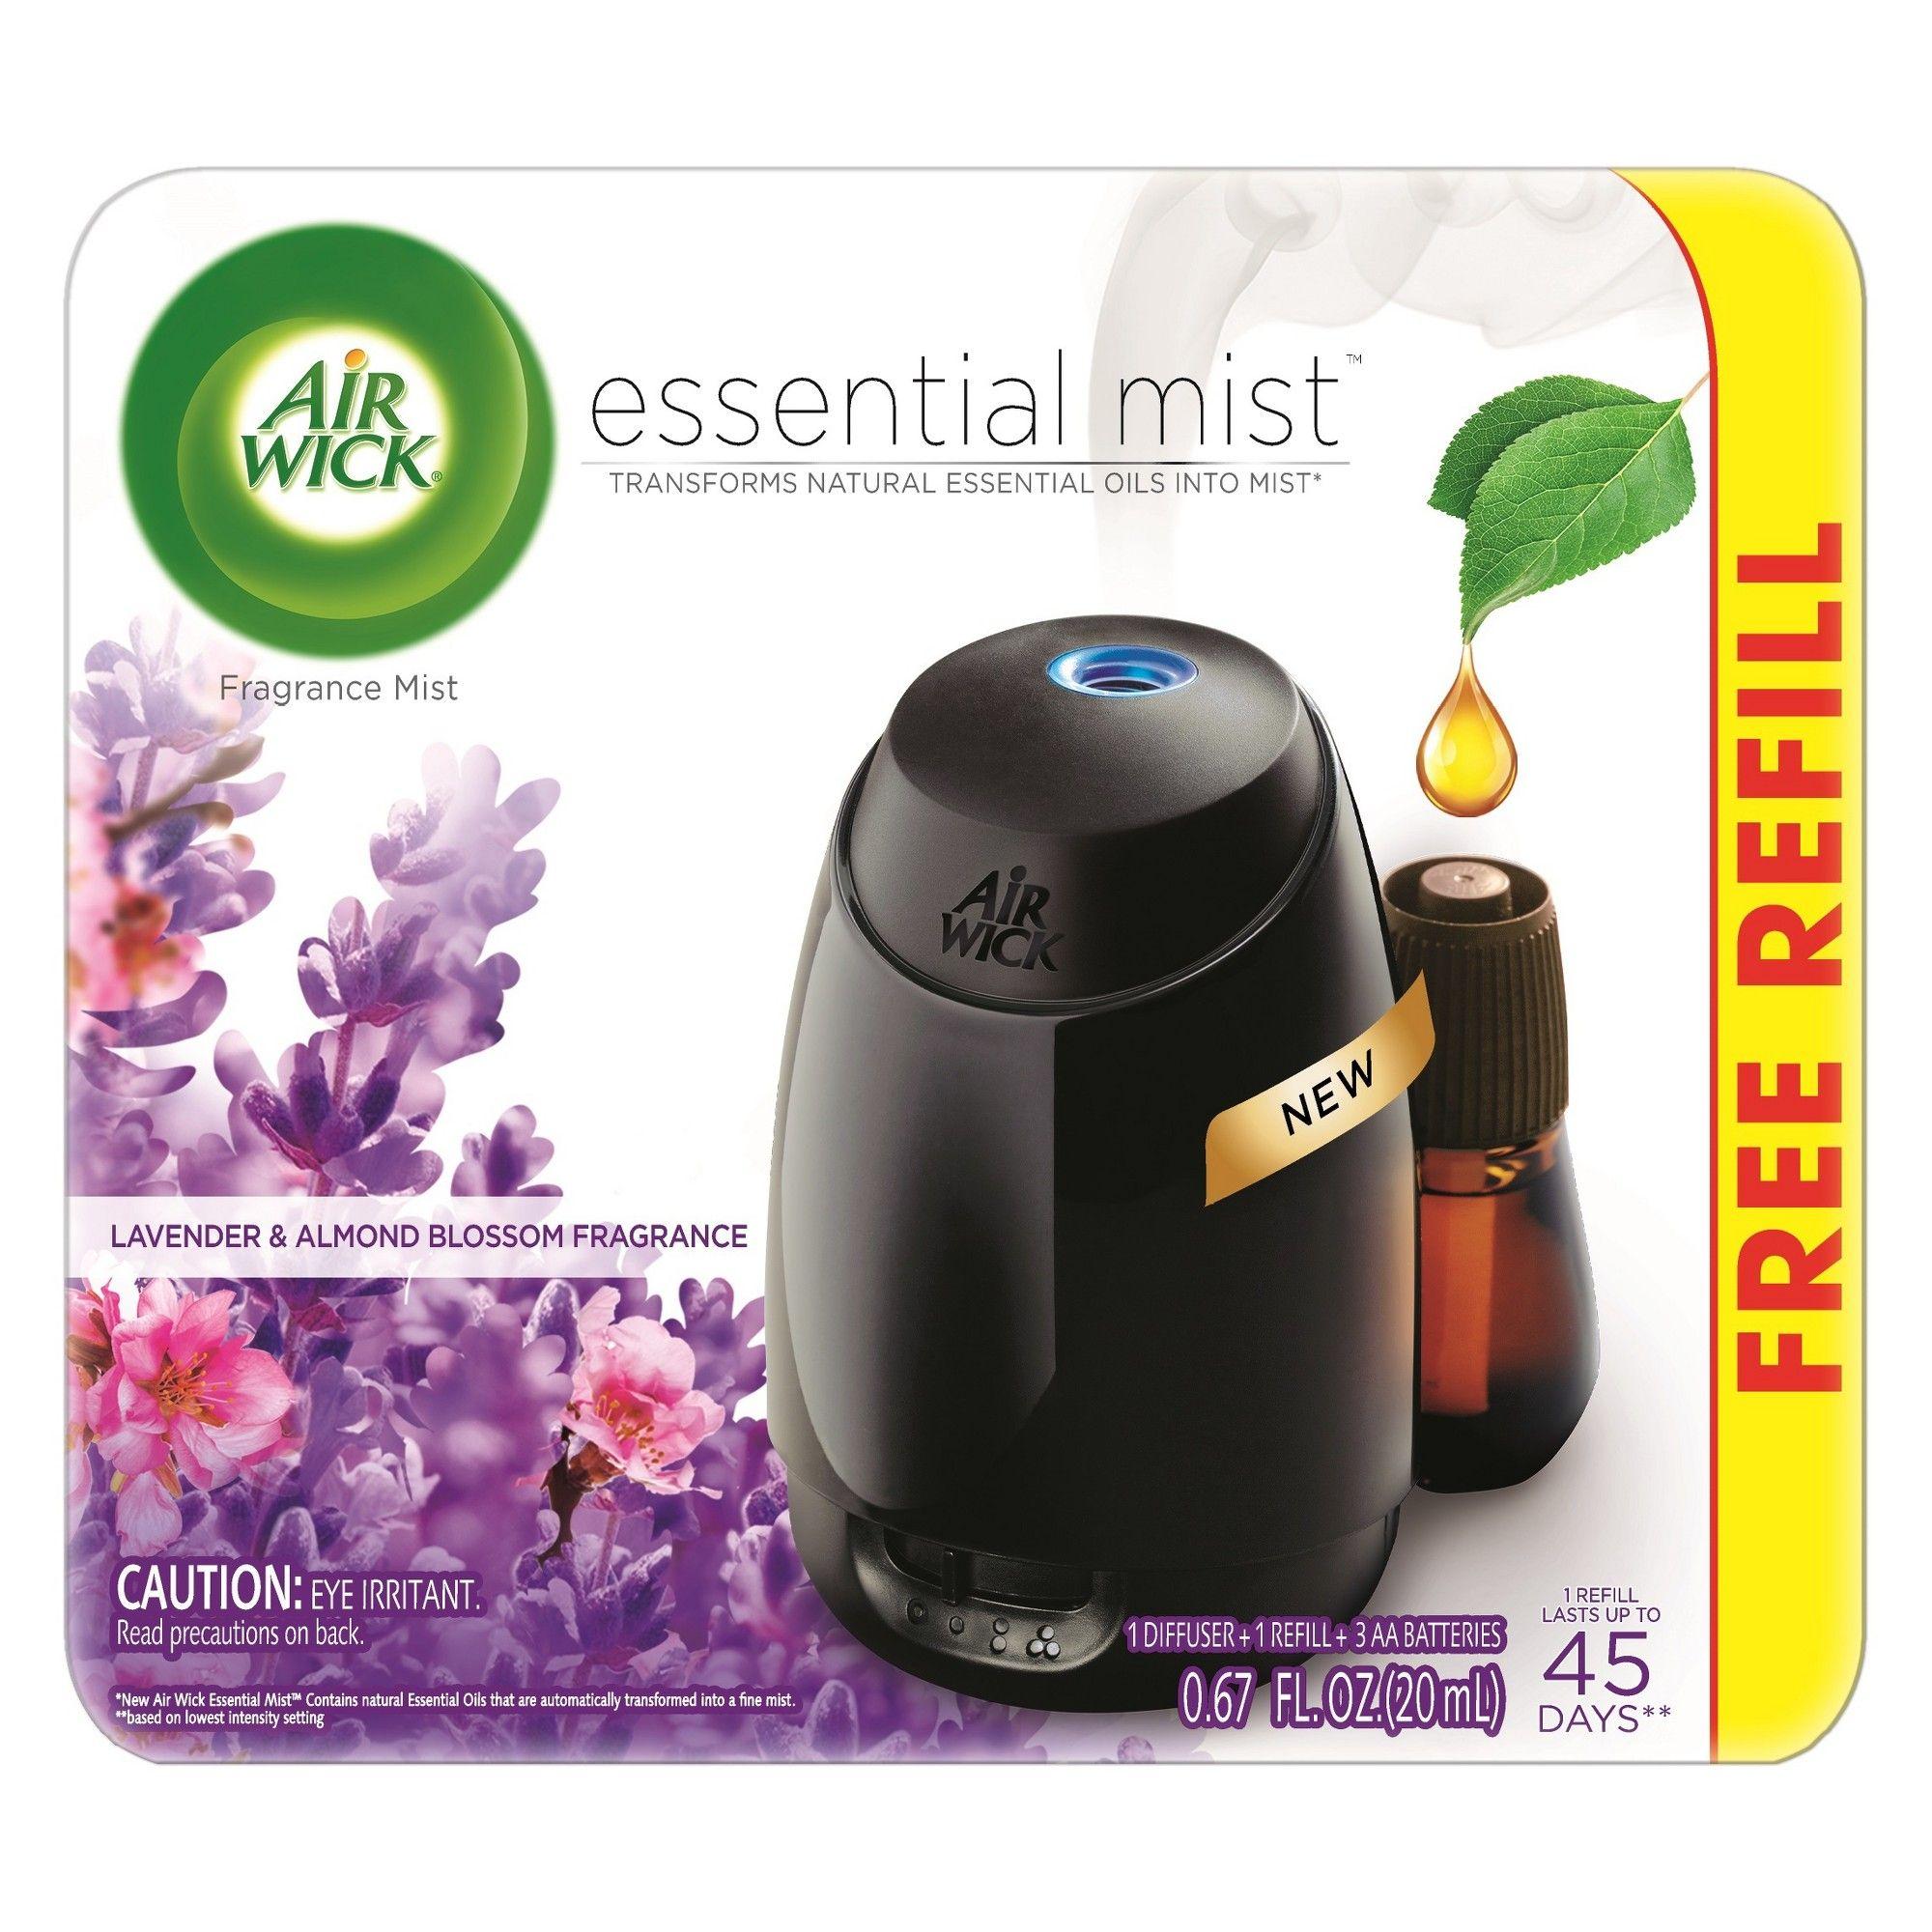 Air Wick Essential Mist Fragrance Oil Diffuser Kit Gadget 1 Refill Fresh Water Breeze Air Freshener Homedecorideas Home Decor Ideas Fragrance Oil Di